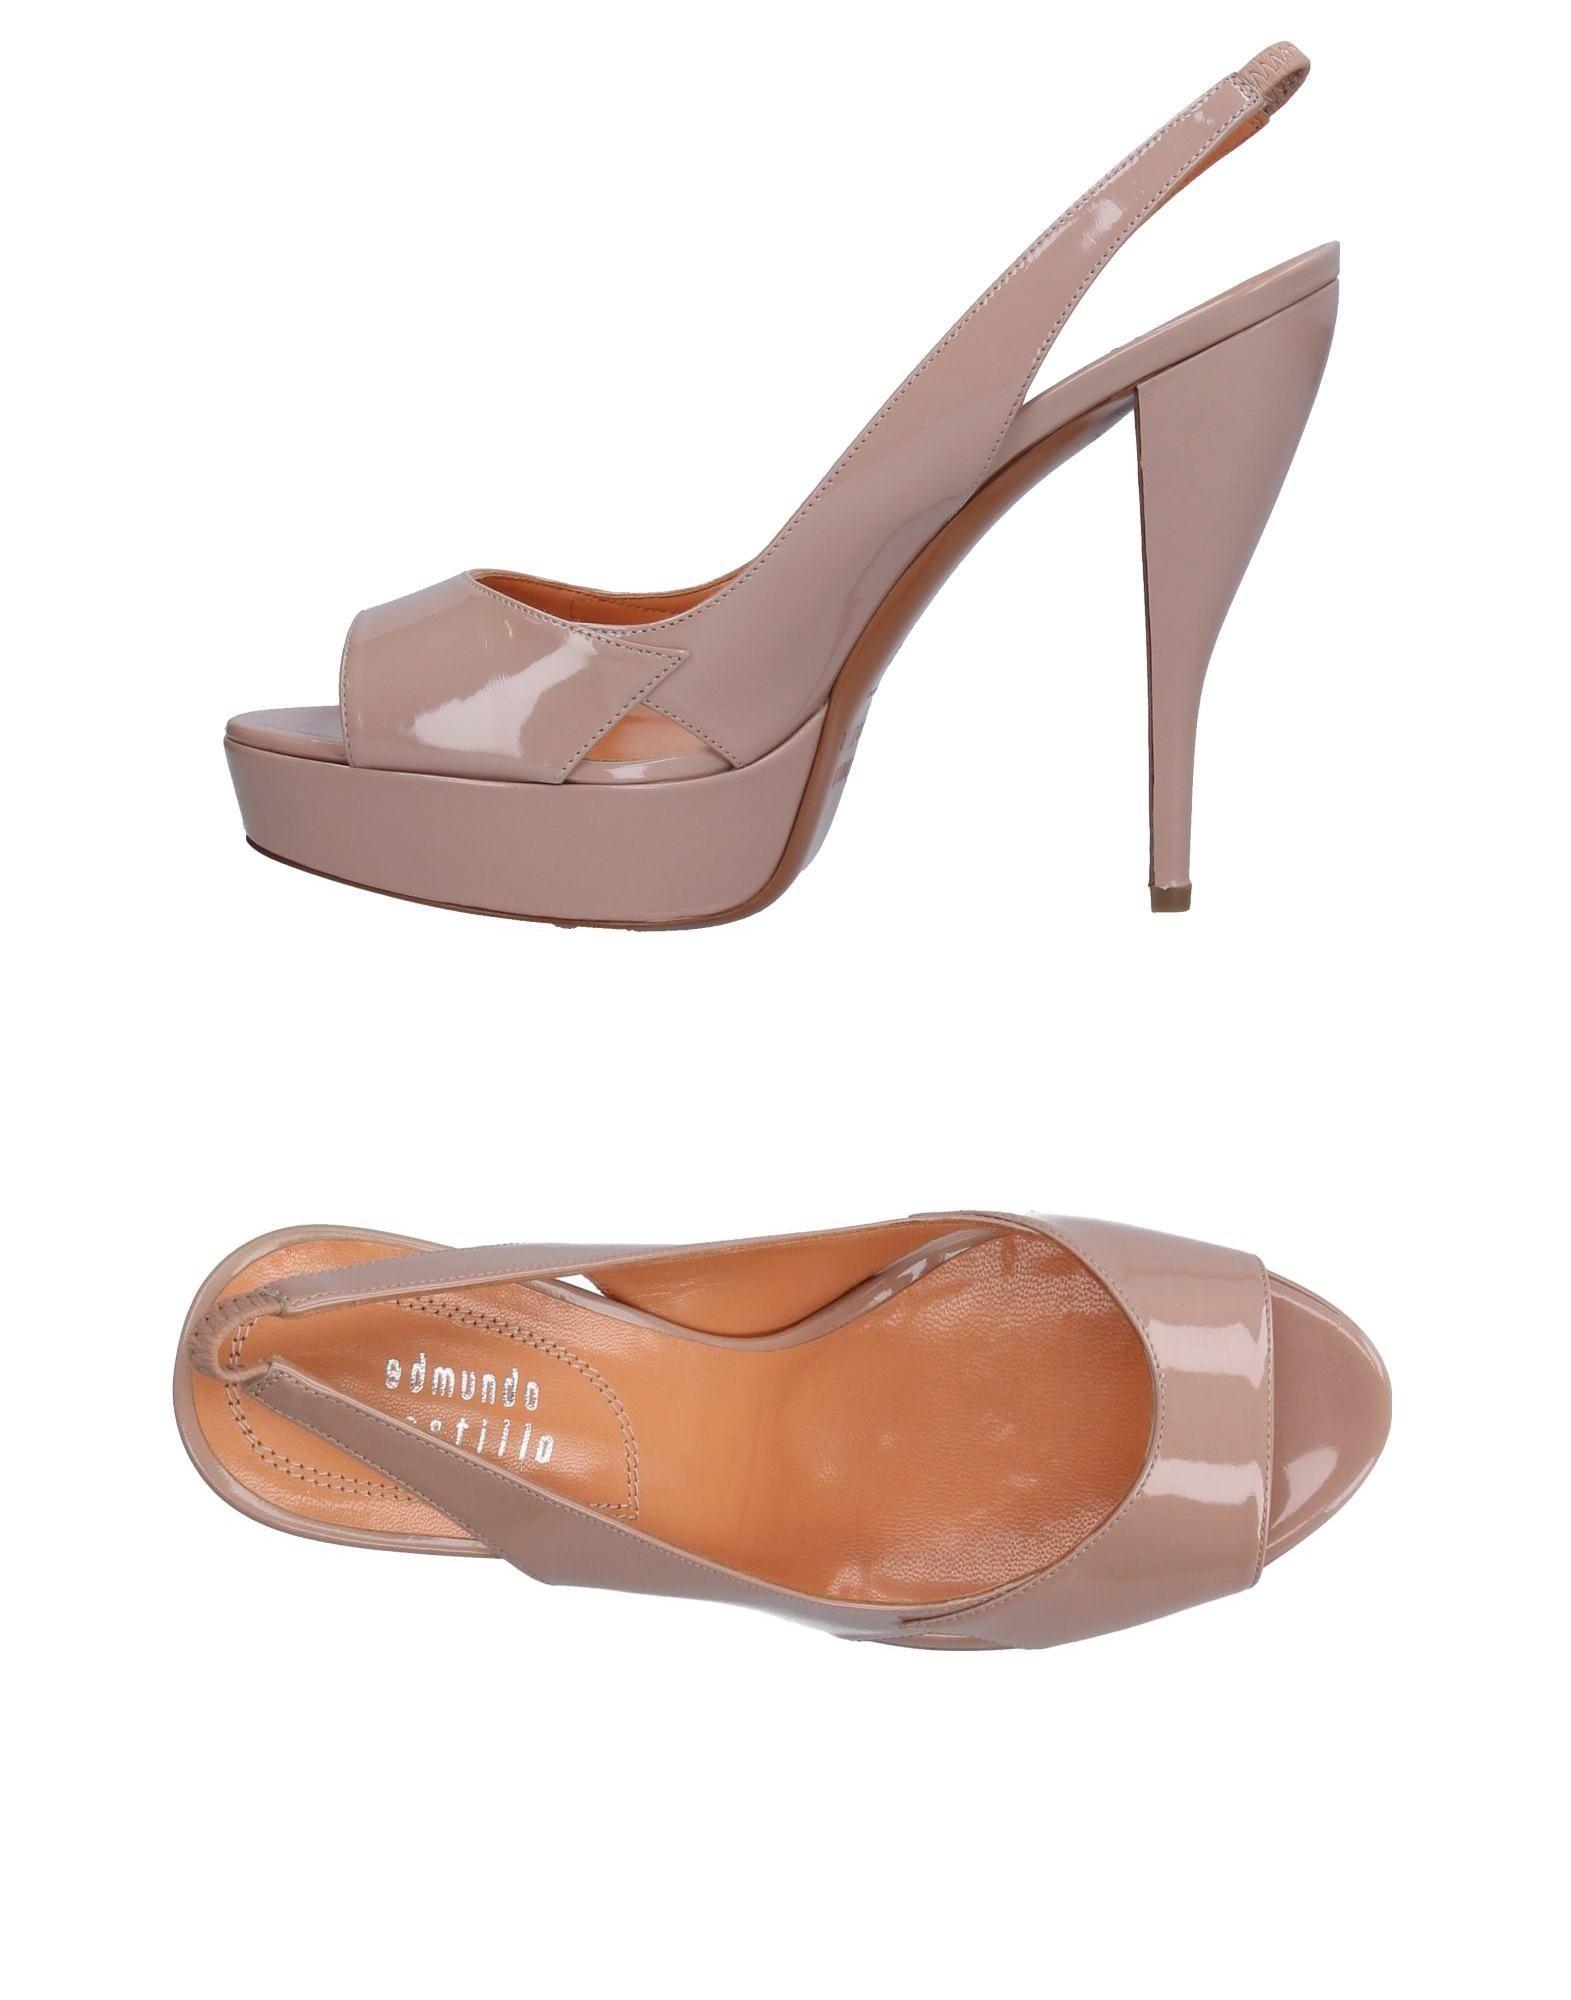 EDMUNDO CASTILLO Sandals in Pale Pink